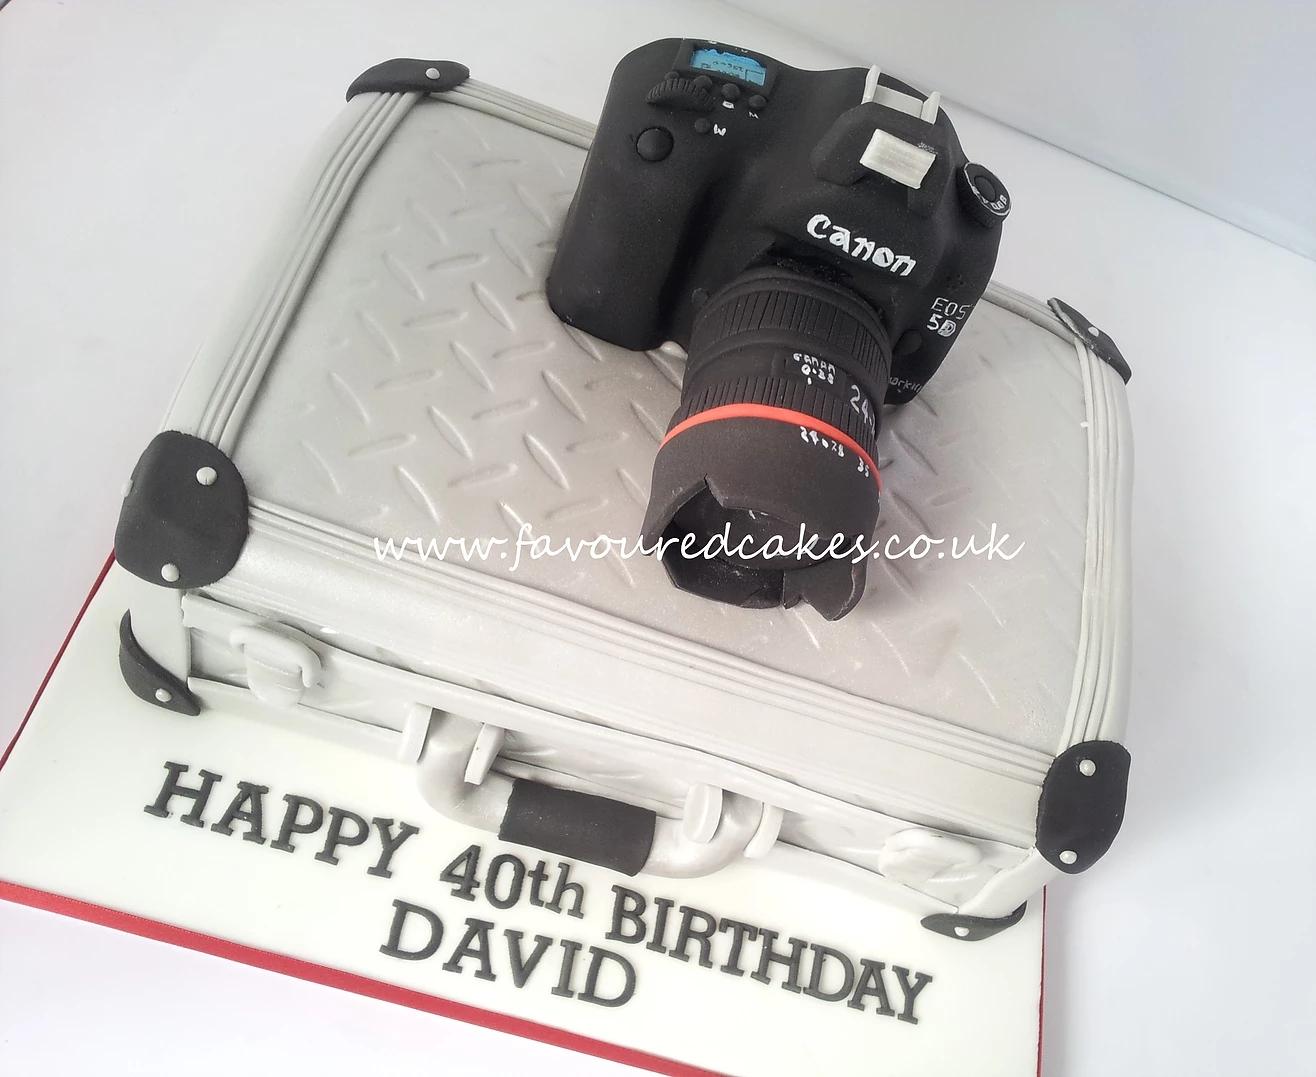 Camera & Camera Box Cake CB02